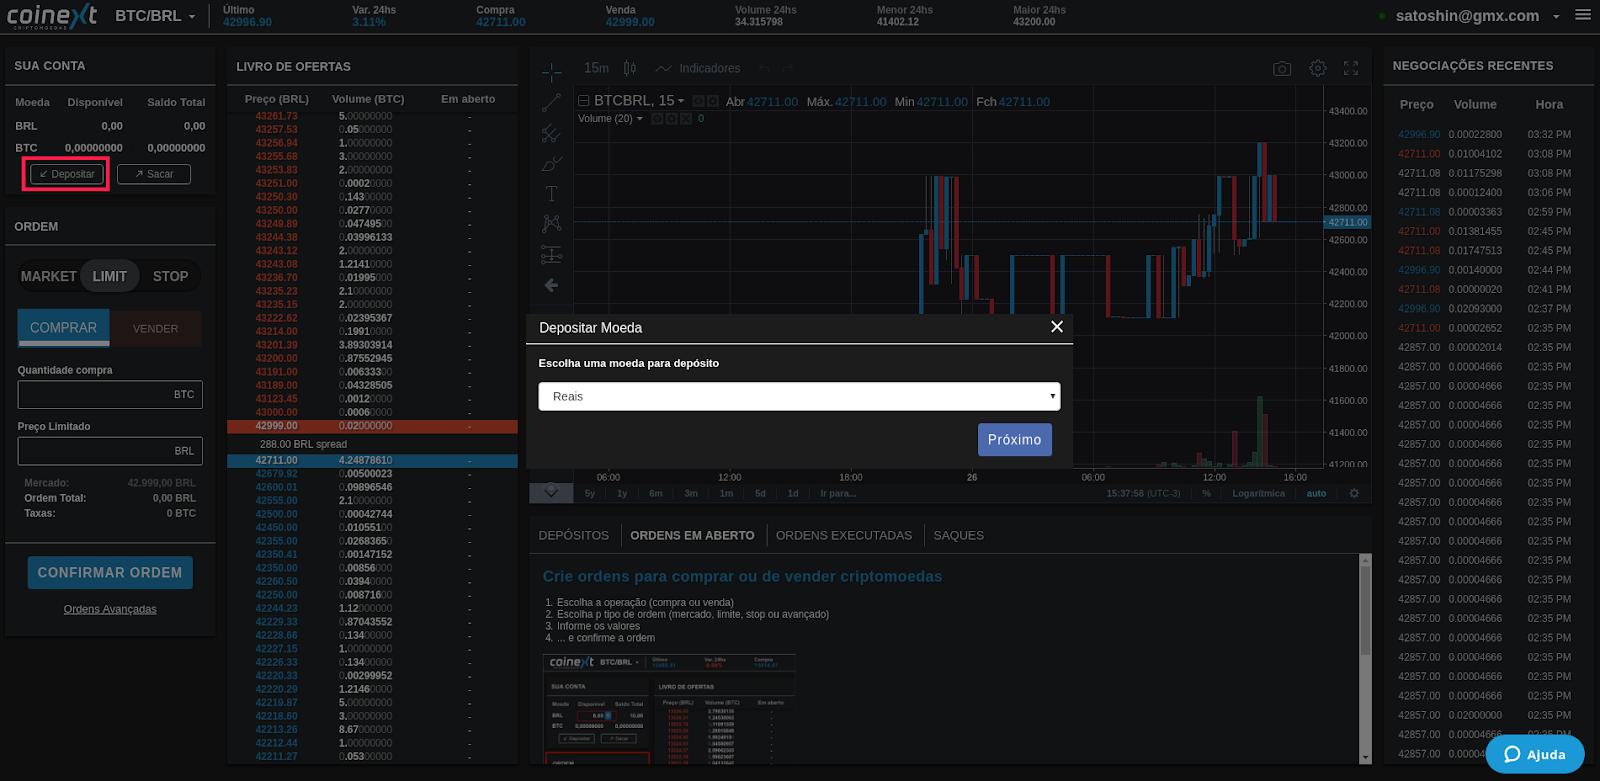 Interface plataforma Coinext - Depositar